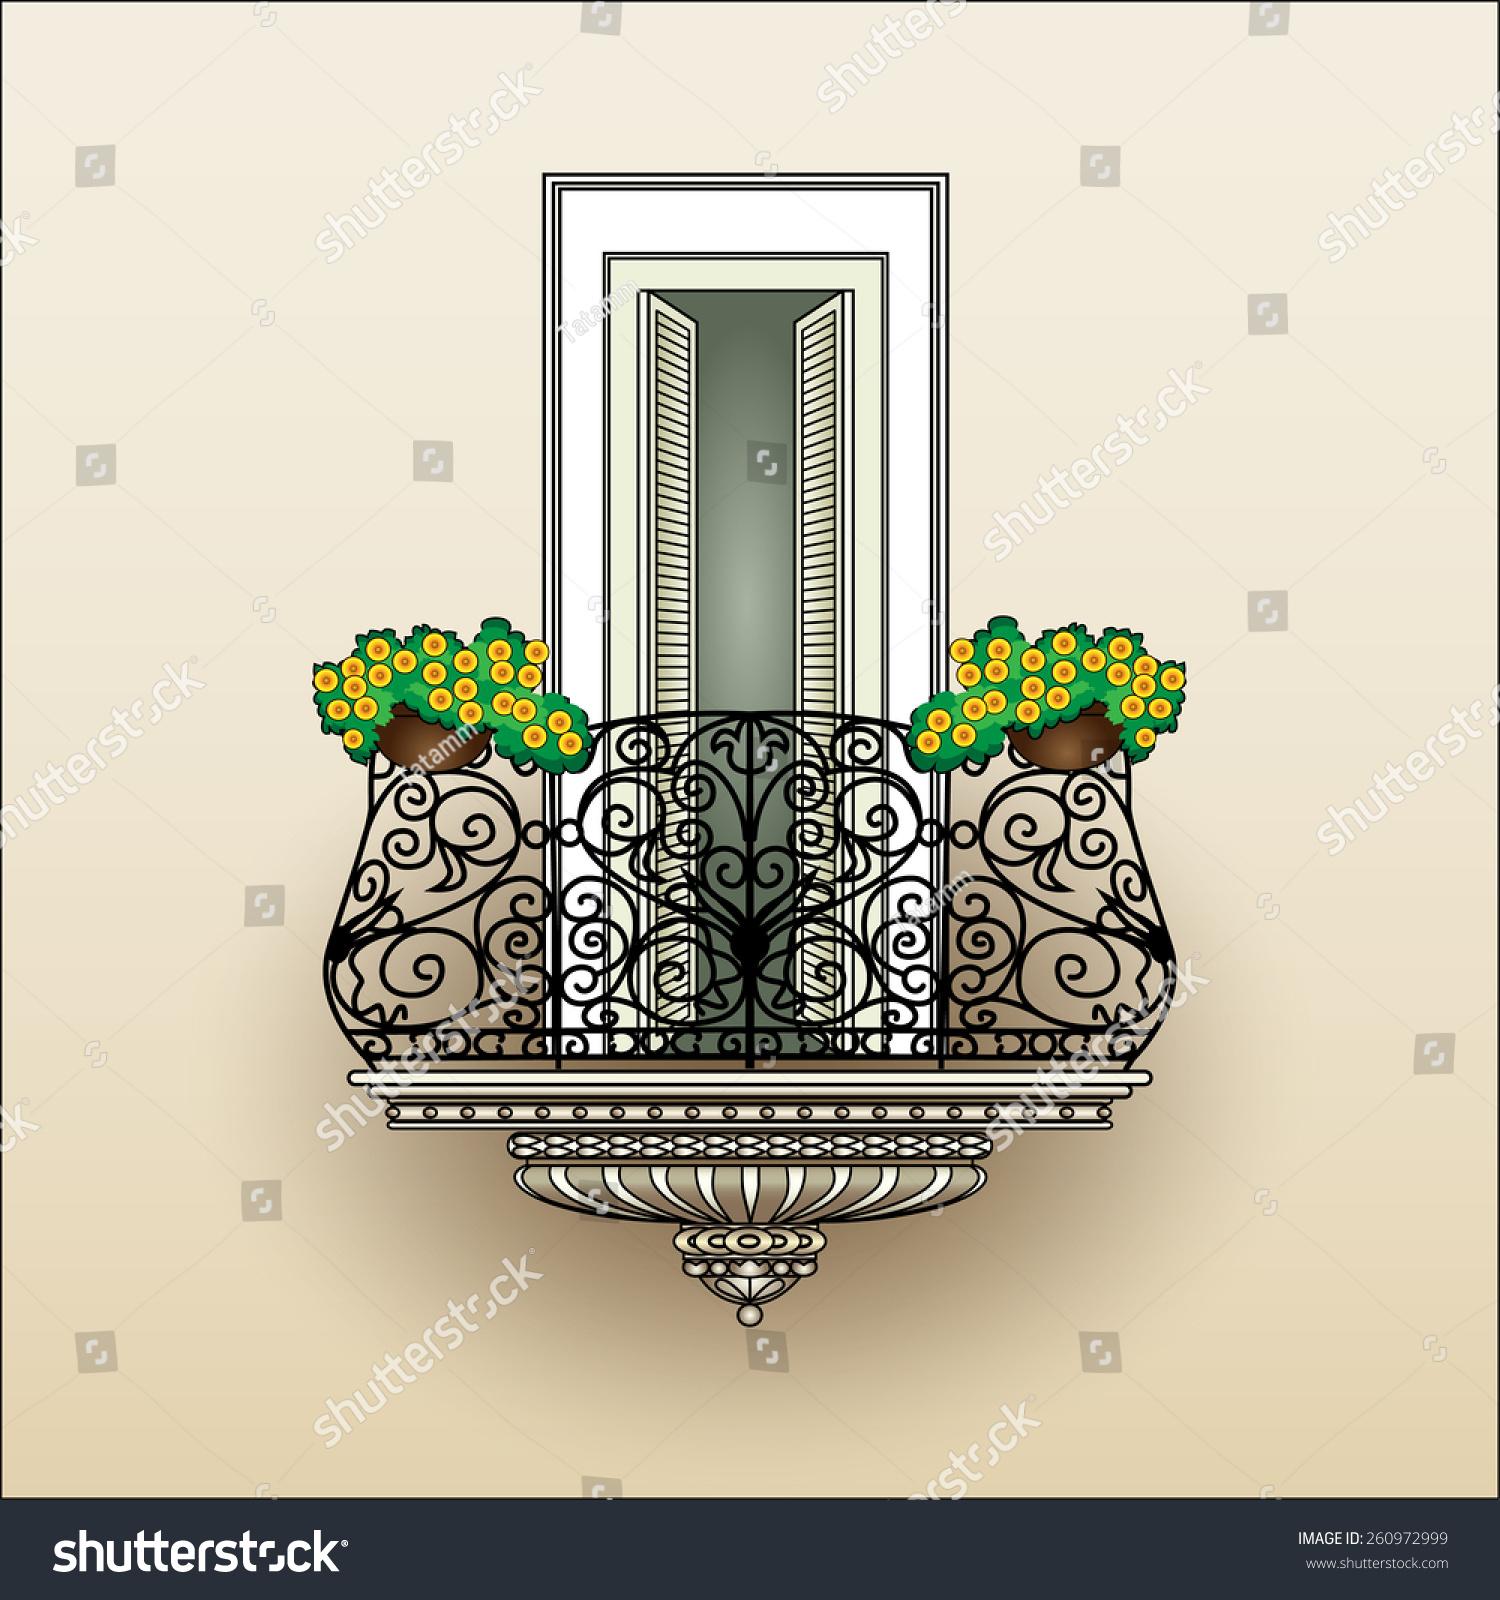 Balcony wrought iron railing classic style stock vector for Balcony vector